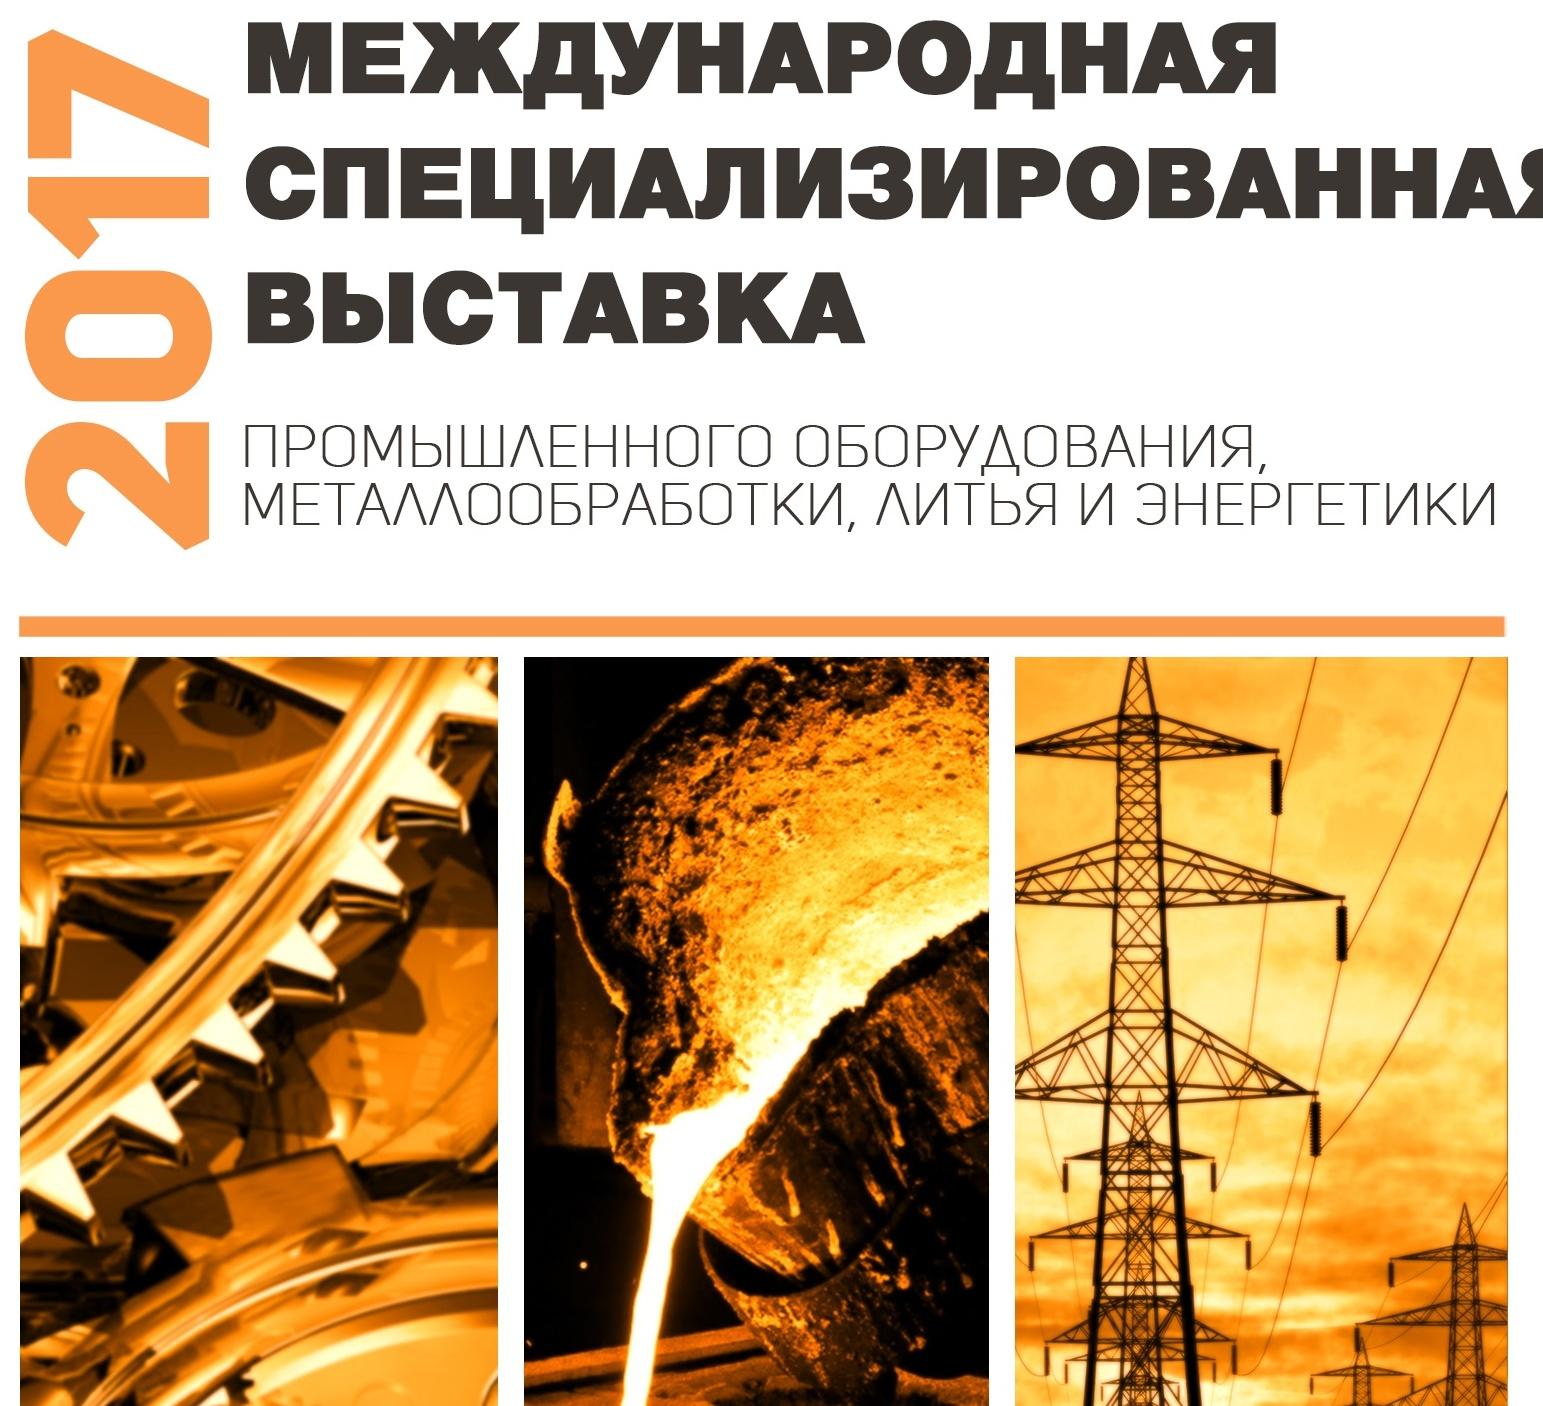 Mashprom_2017_A5_gorizont_rus